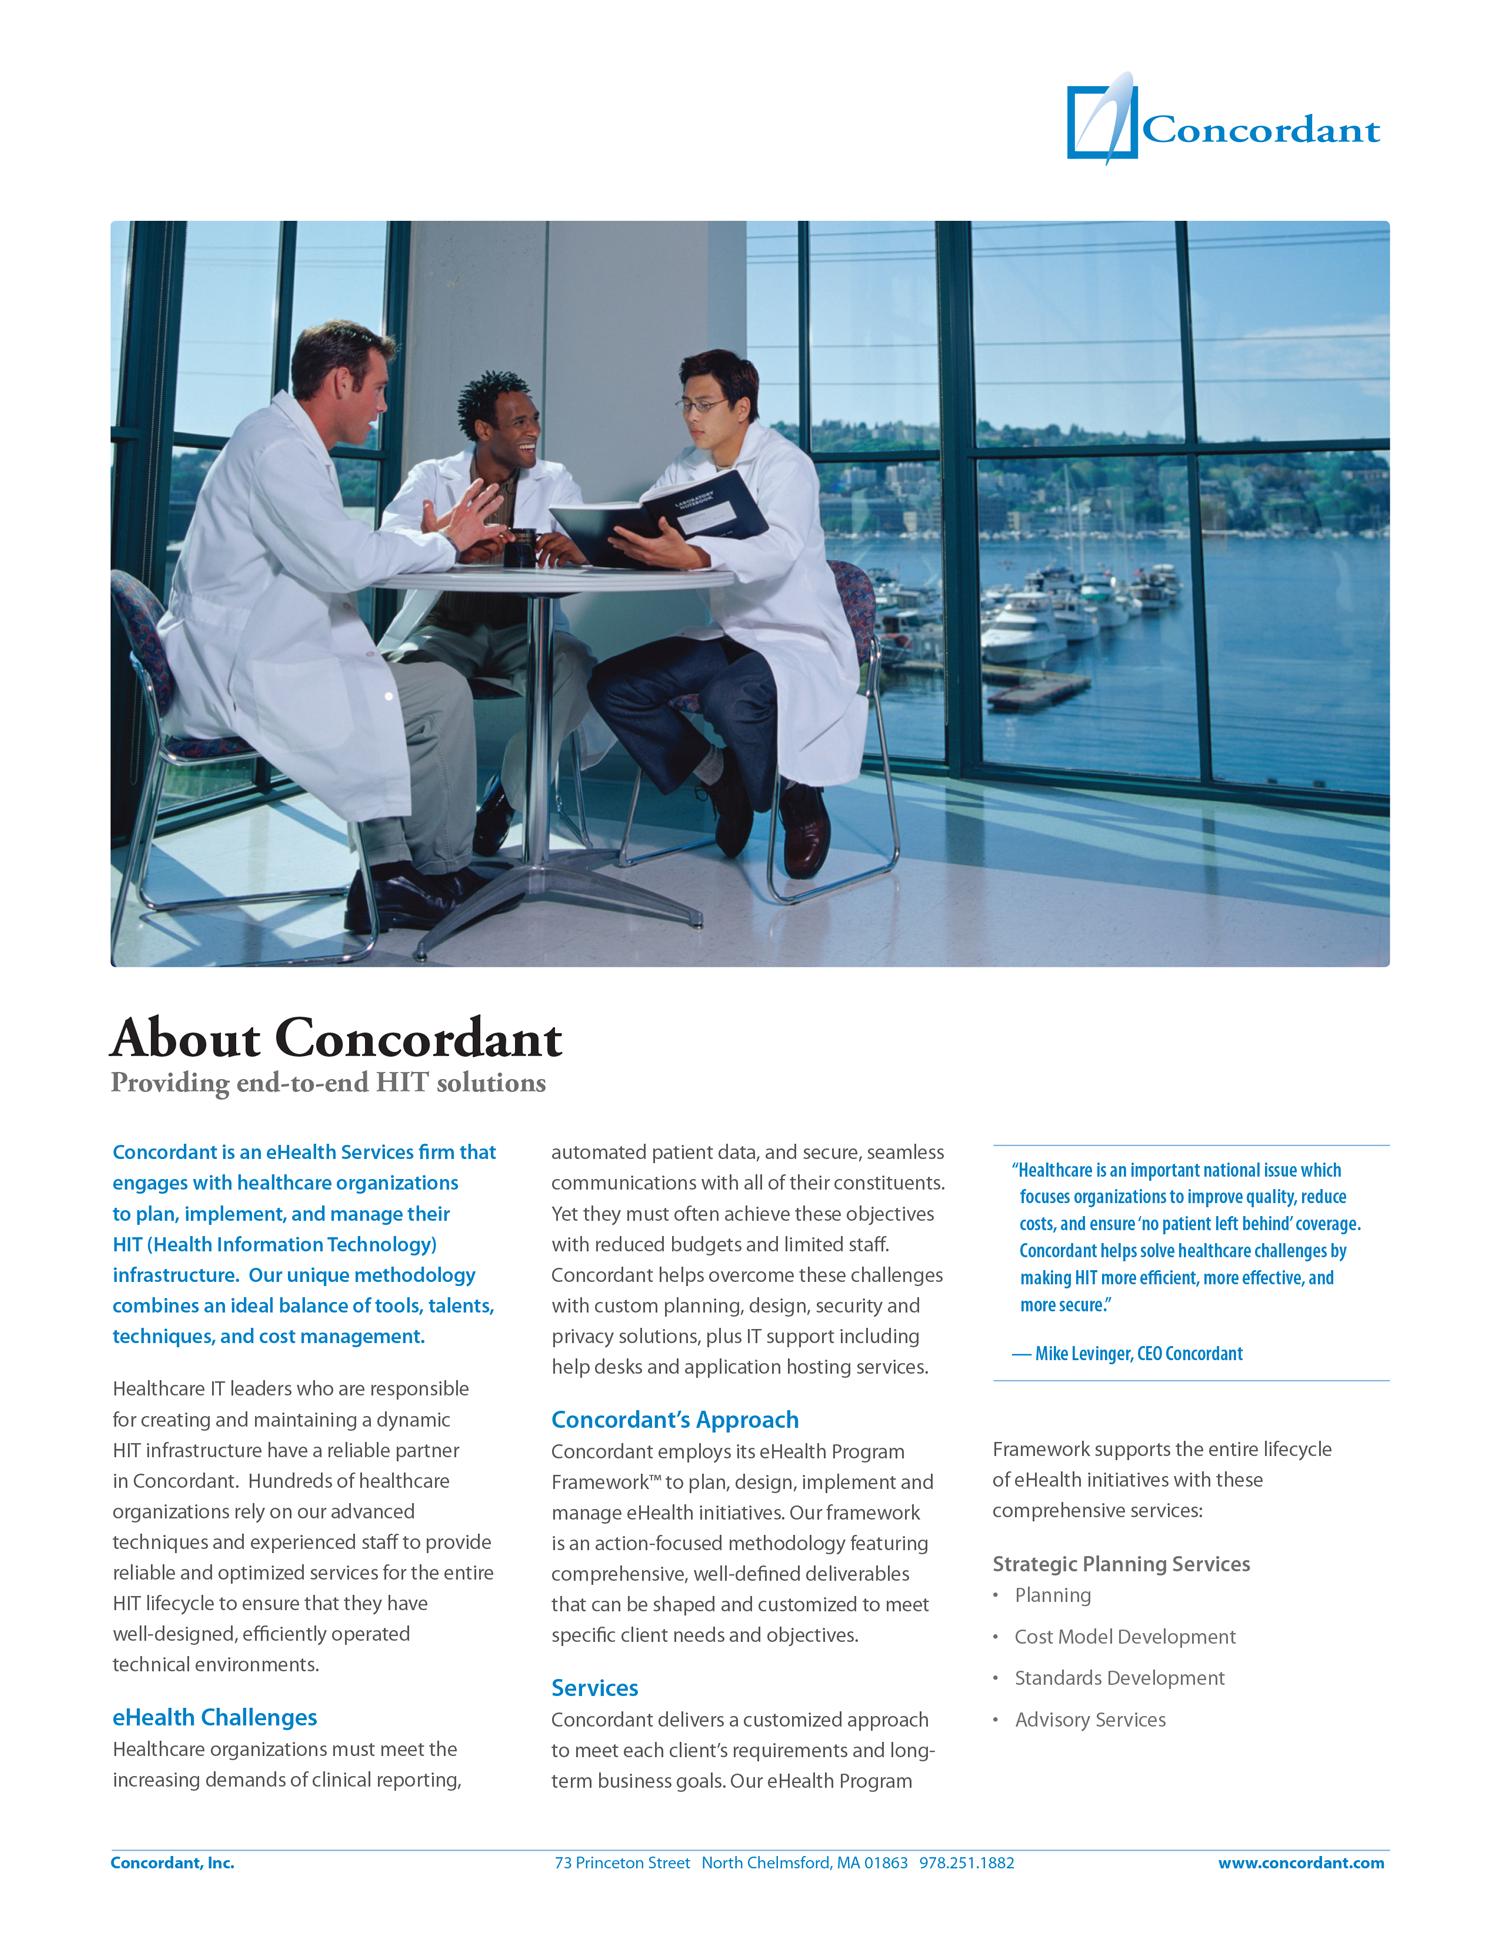 ConcordantSheet_Overview_p1.png